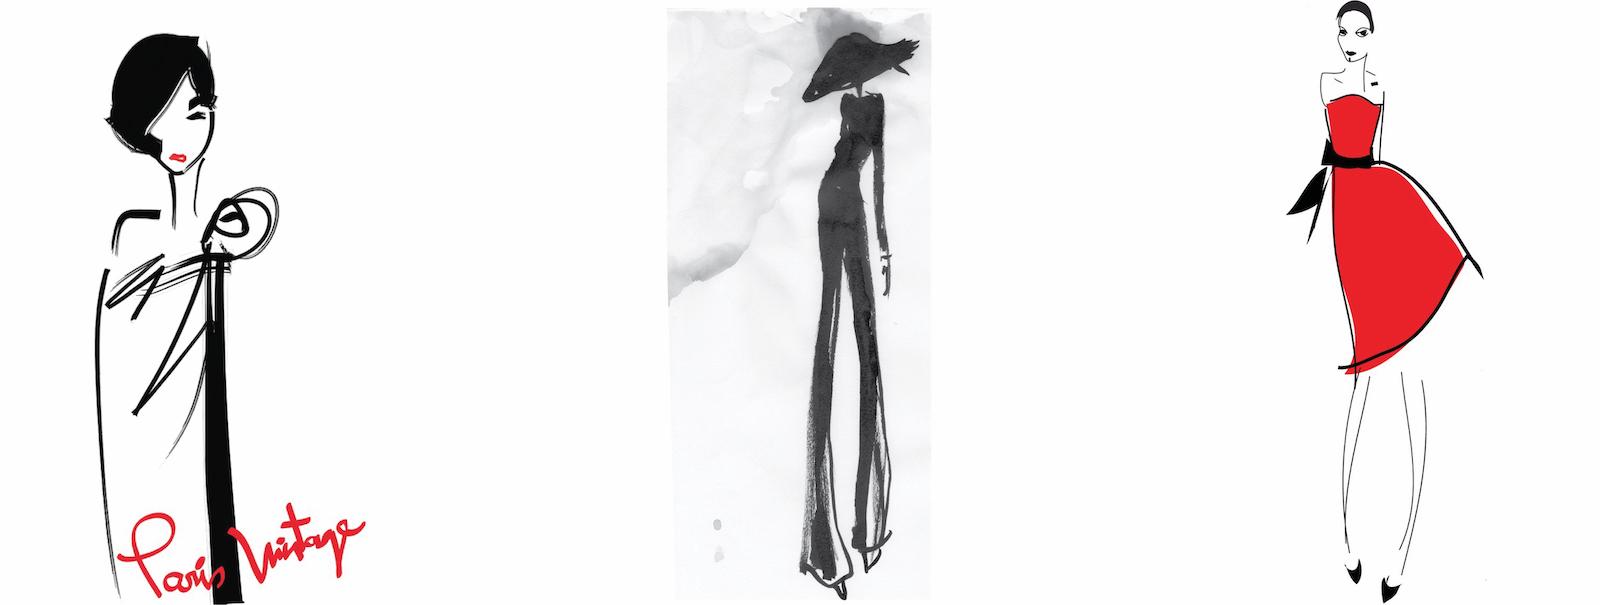 fashion illustration pages 1